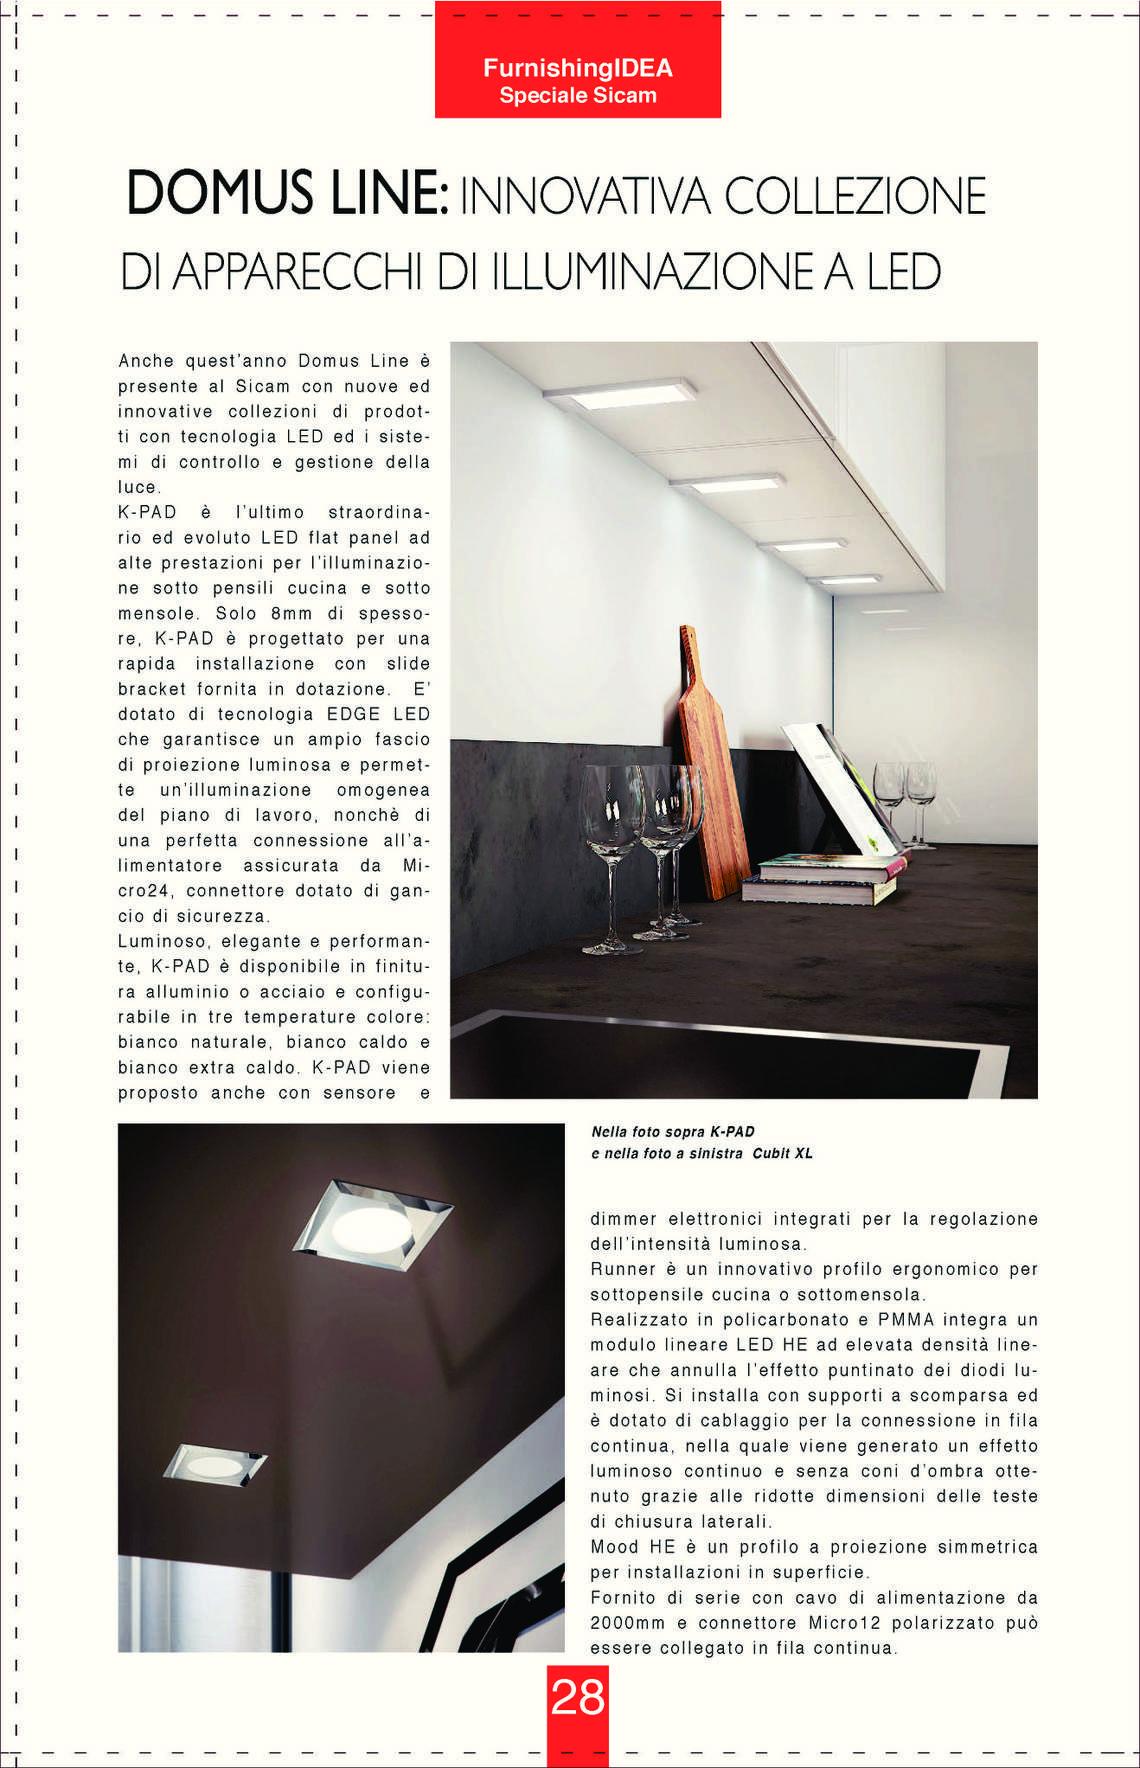 sicam-2016_journal_4_027.jpg